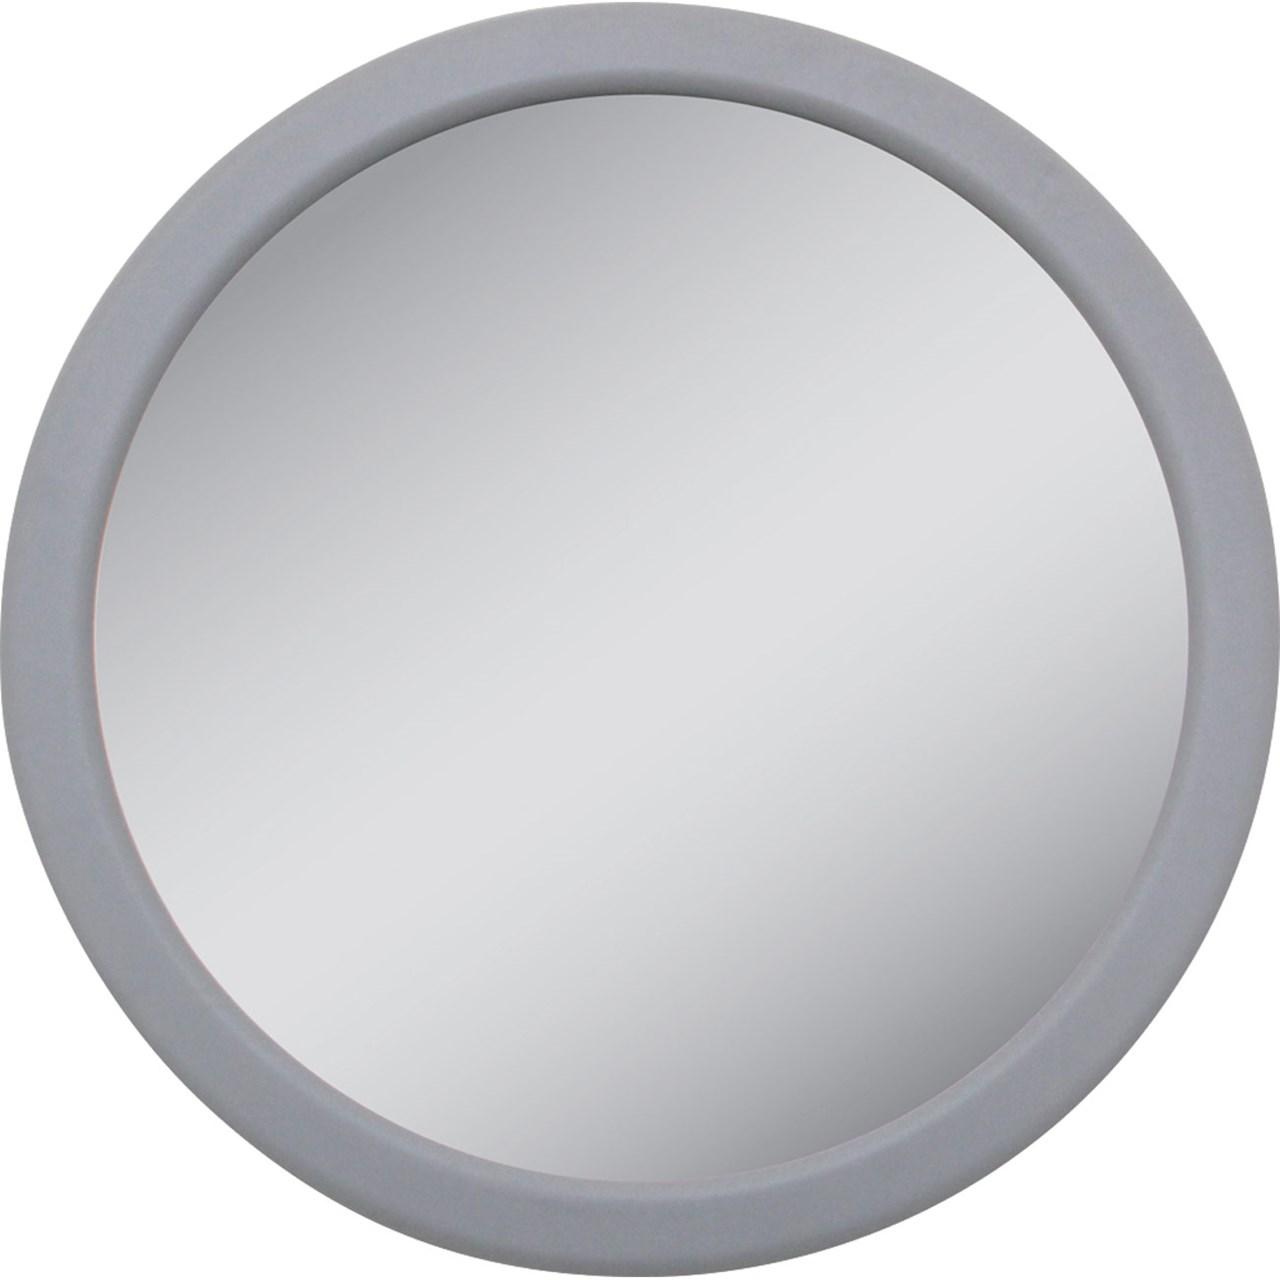 Maxiaids Compact E Z Grip Close Up Spot Mirror 12x